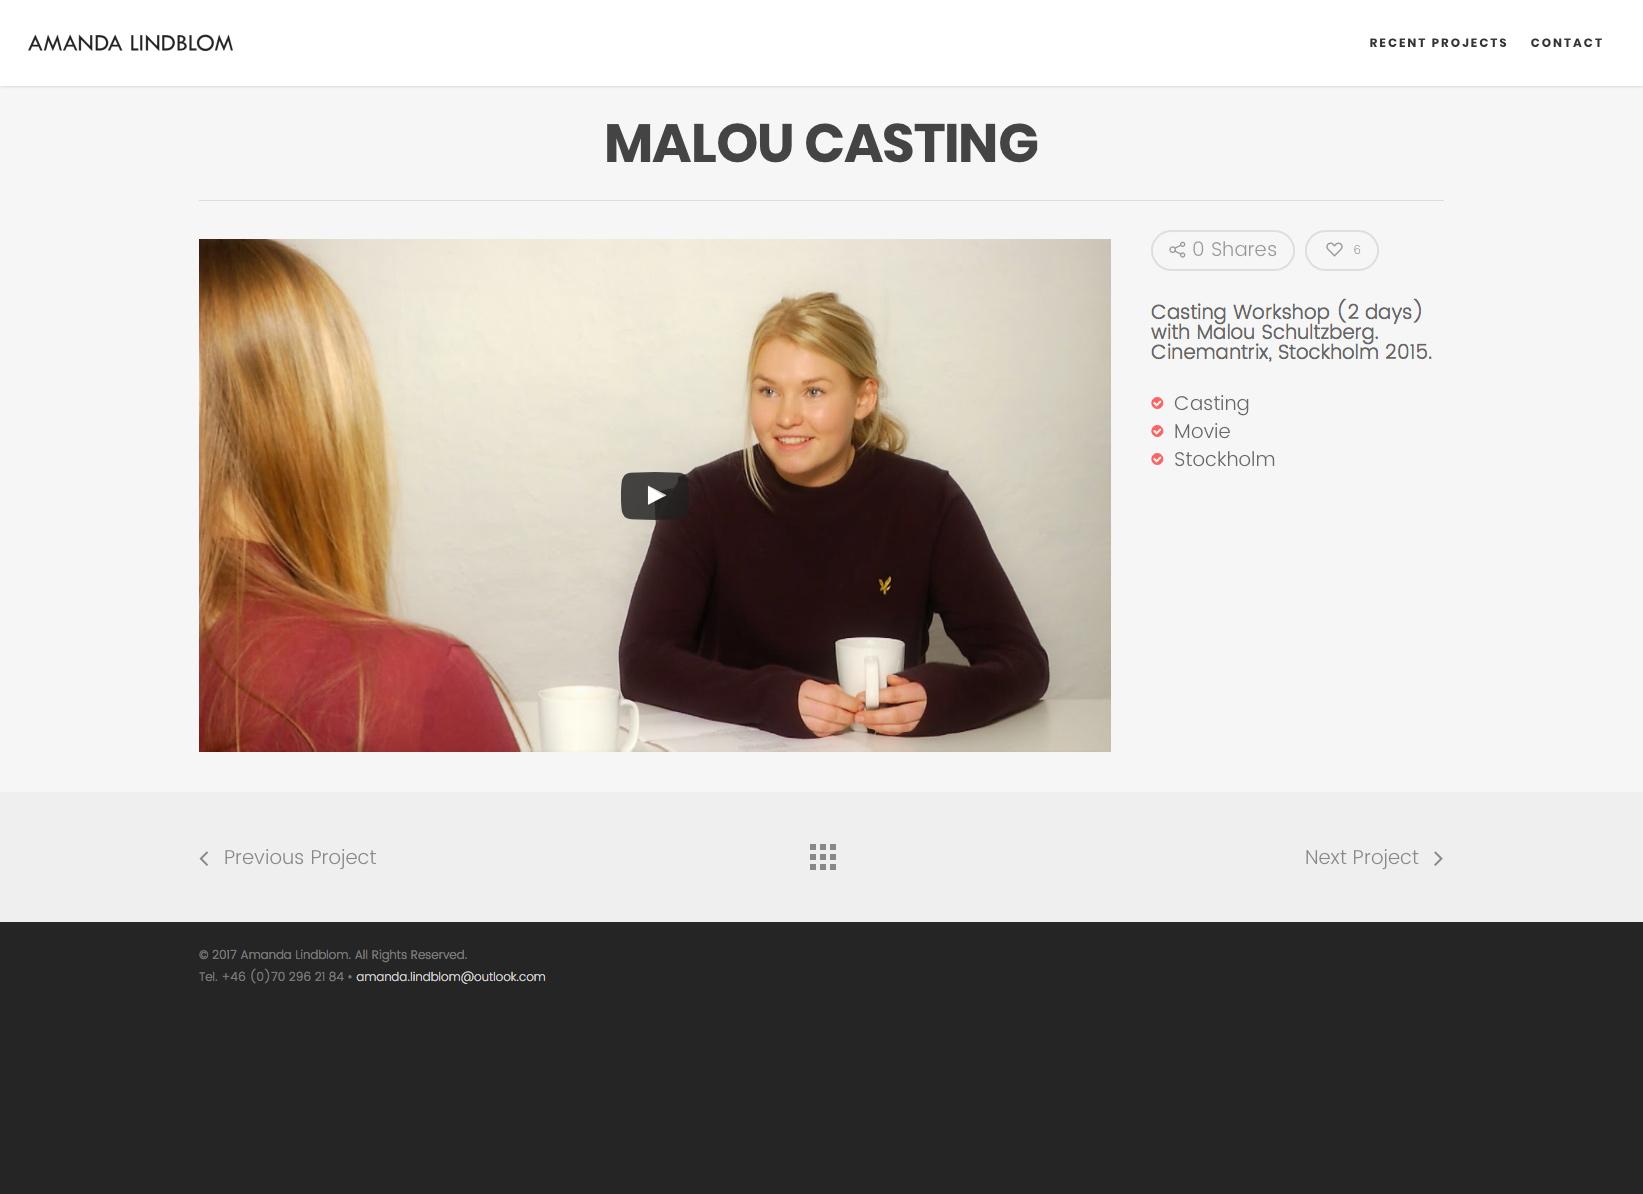 Amanda Lindblom Malou Casting Alexa Produktion